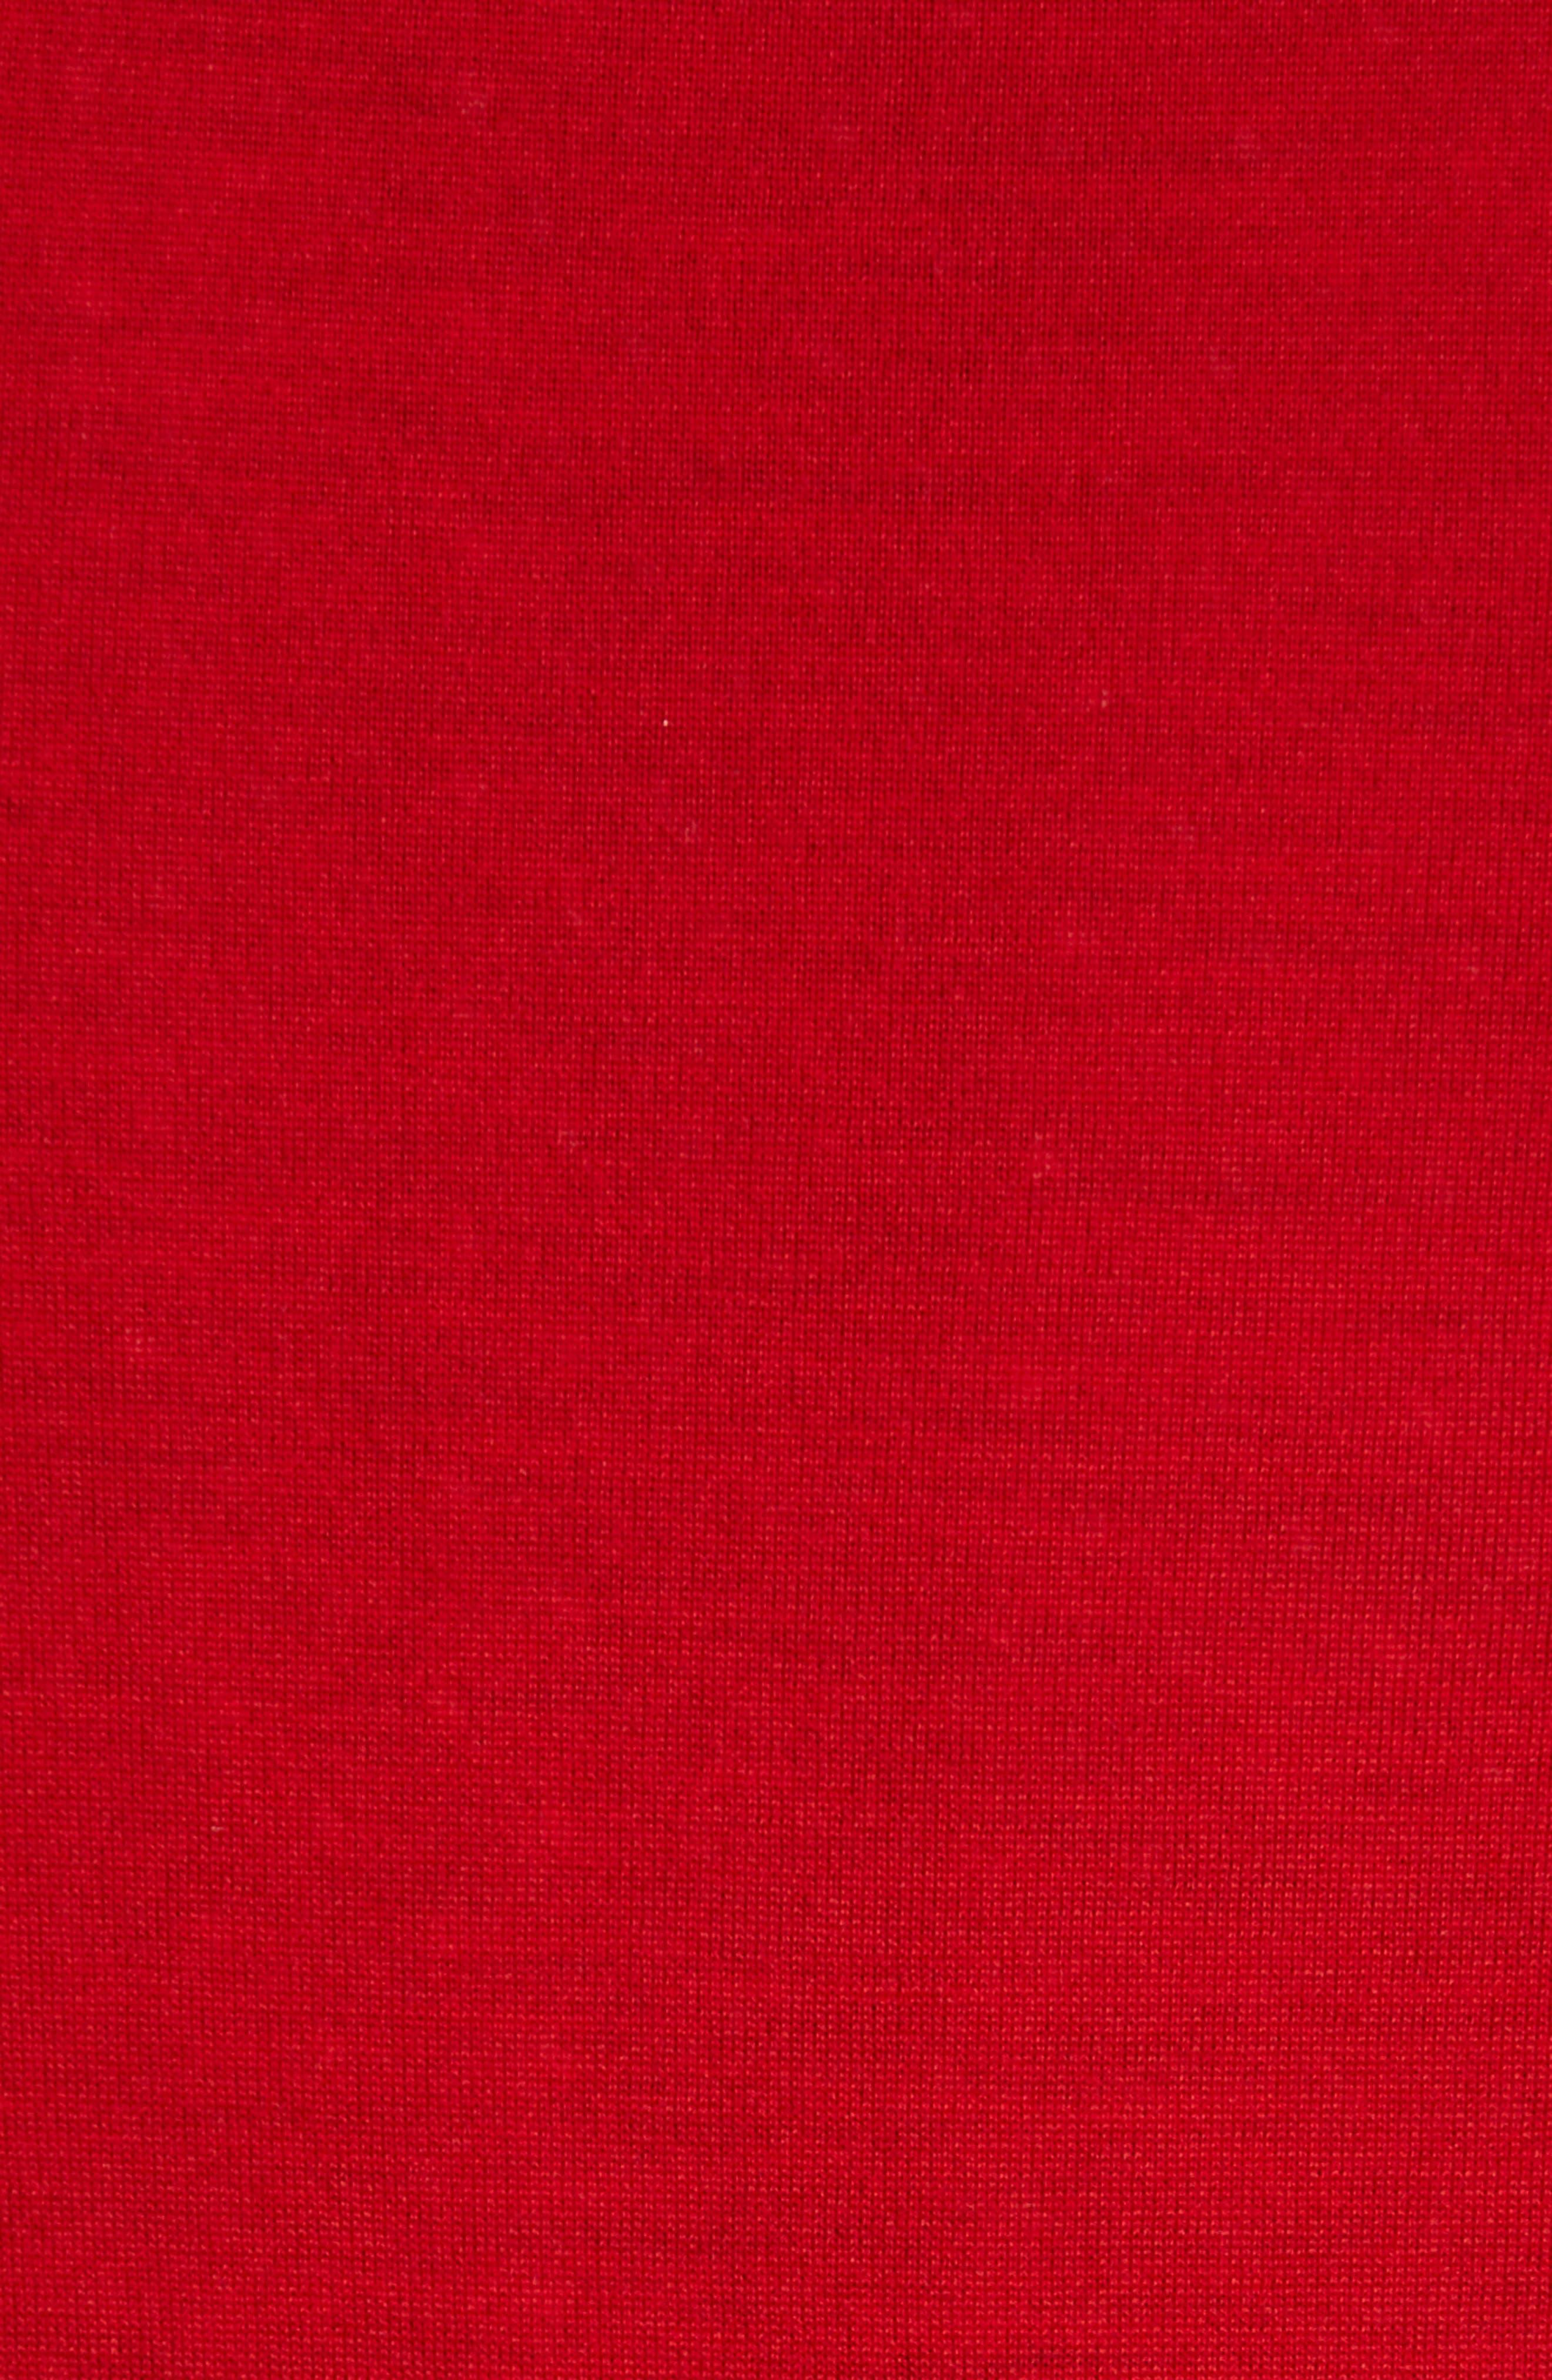 Merino Wool Cardigan,                             Alternate thumbnail 5, color,                             624